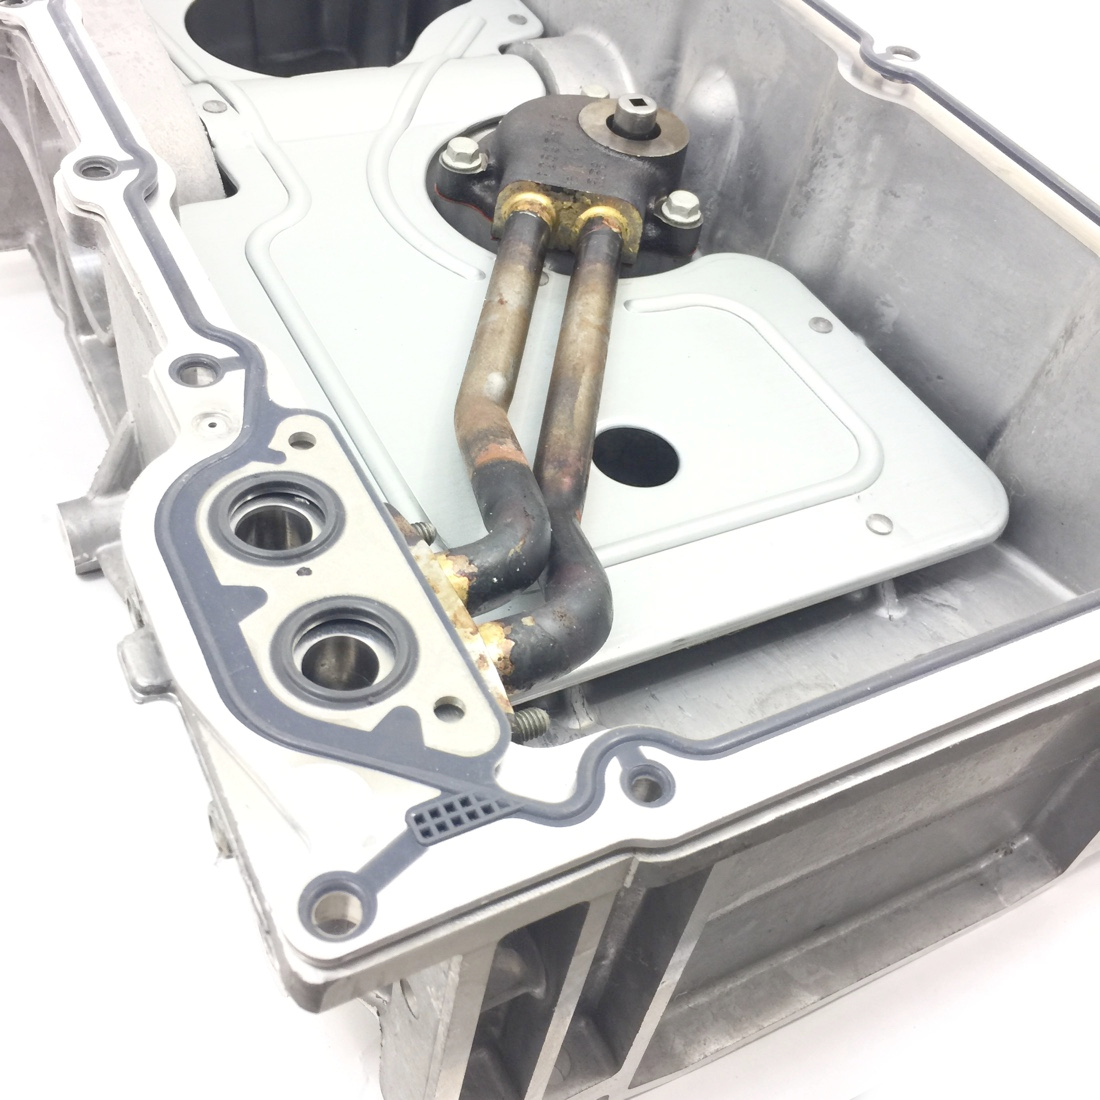 Oil Pans Saab >> Factory New GM OEM Oil Pan 5.3L Isuzu Ascender, Rainier 06-07 #12613437